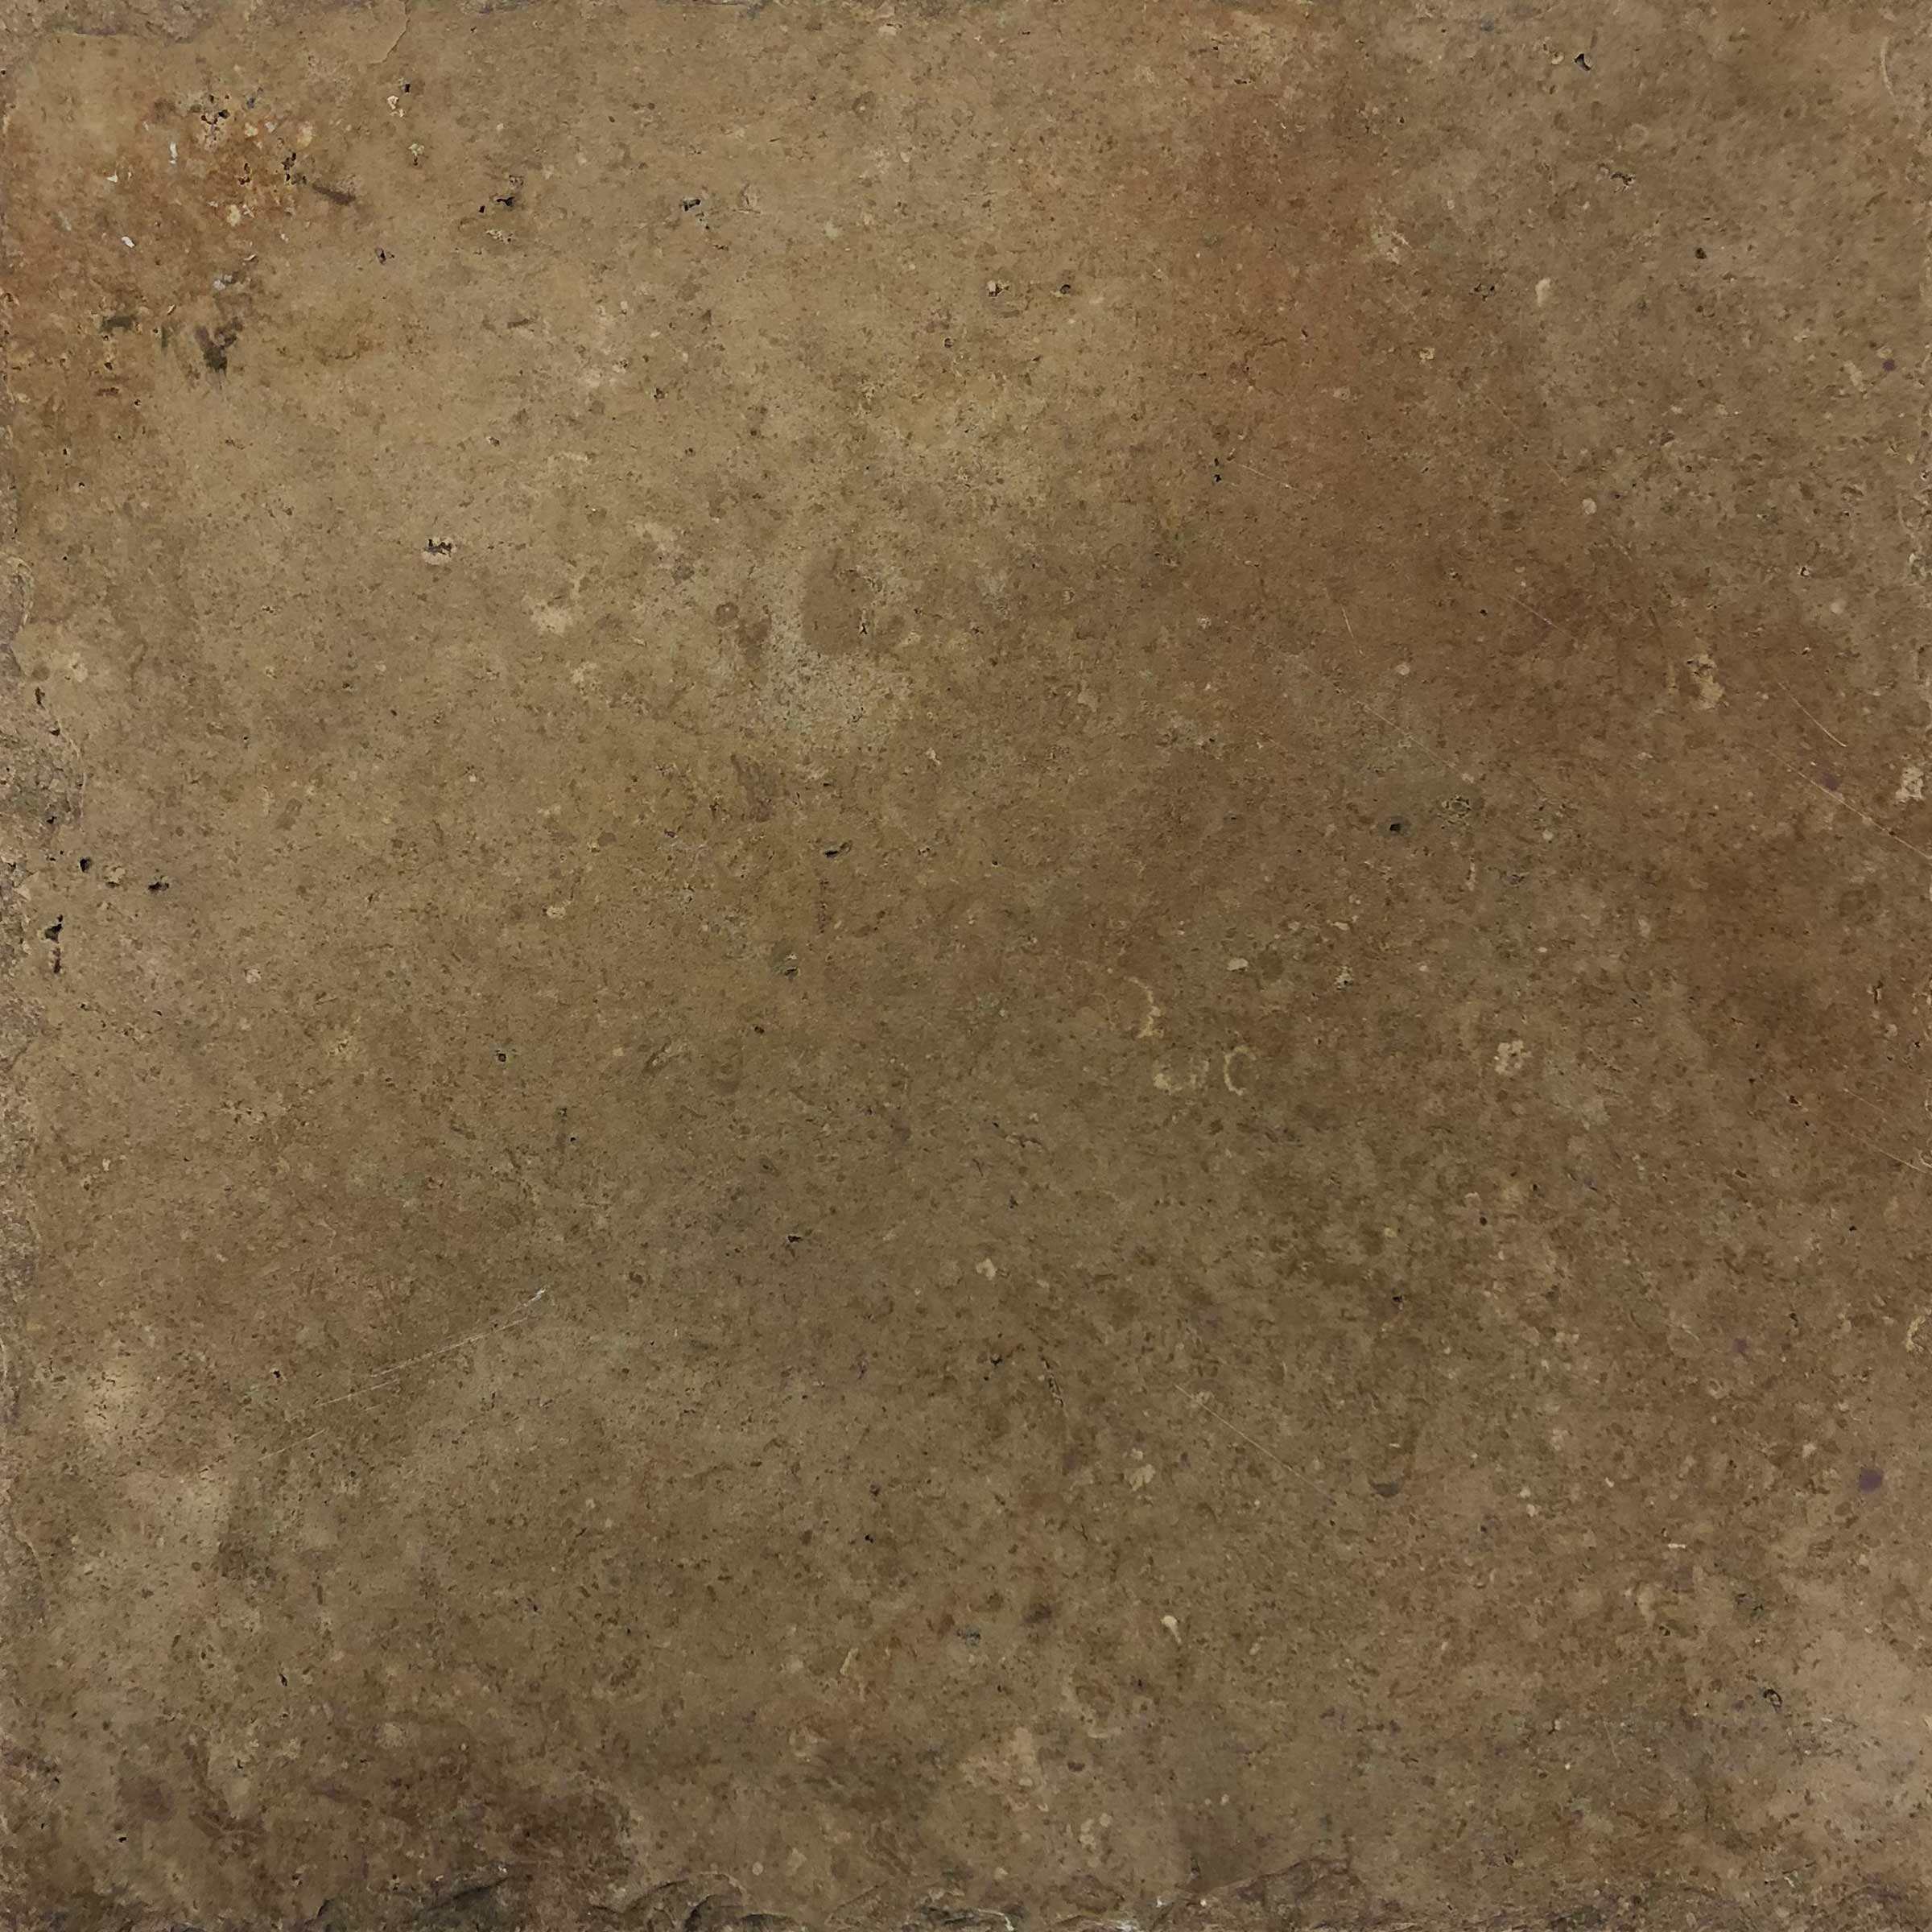 "Item #10947 - 12"" x 12"" Noce Travertine Paver (Chiseled) Image"